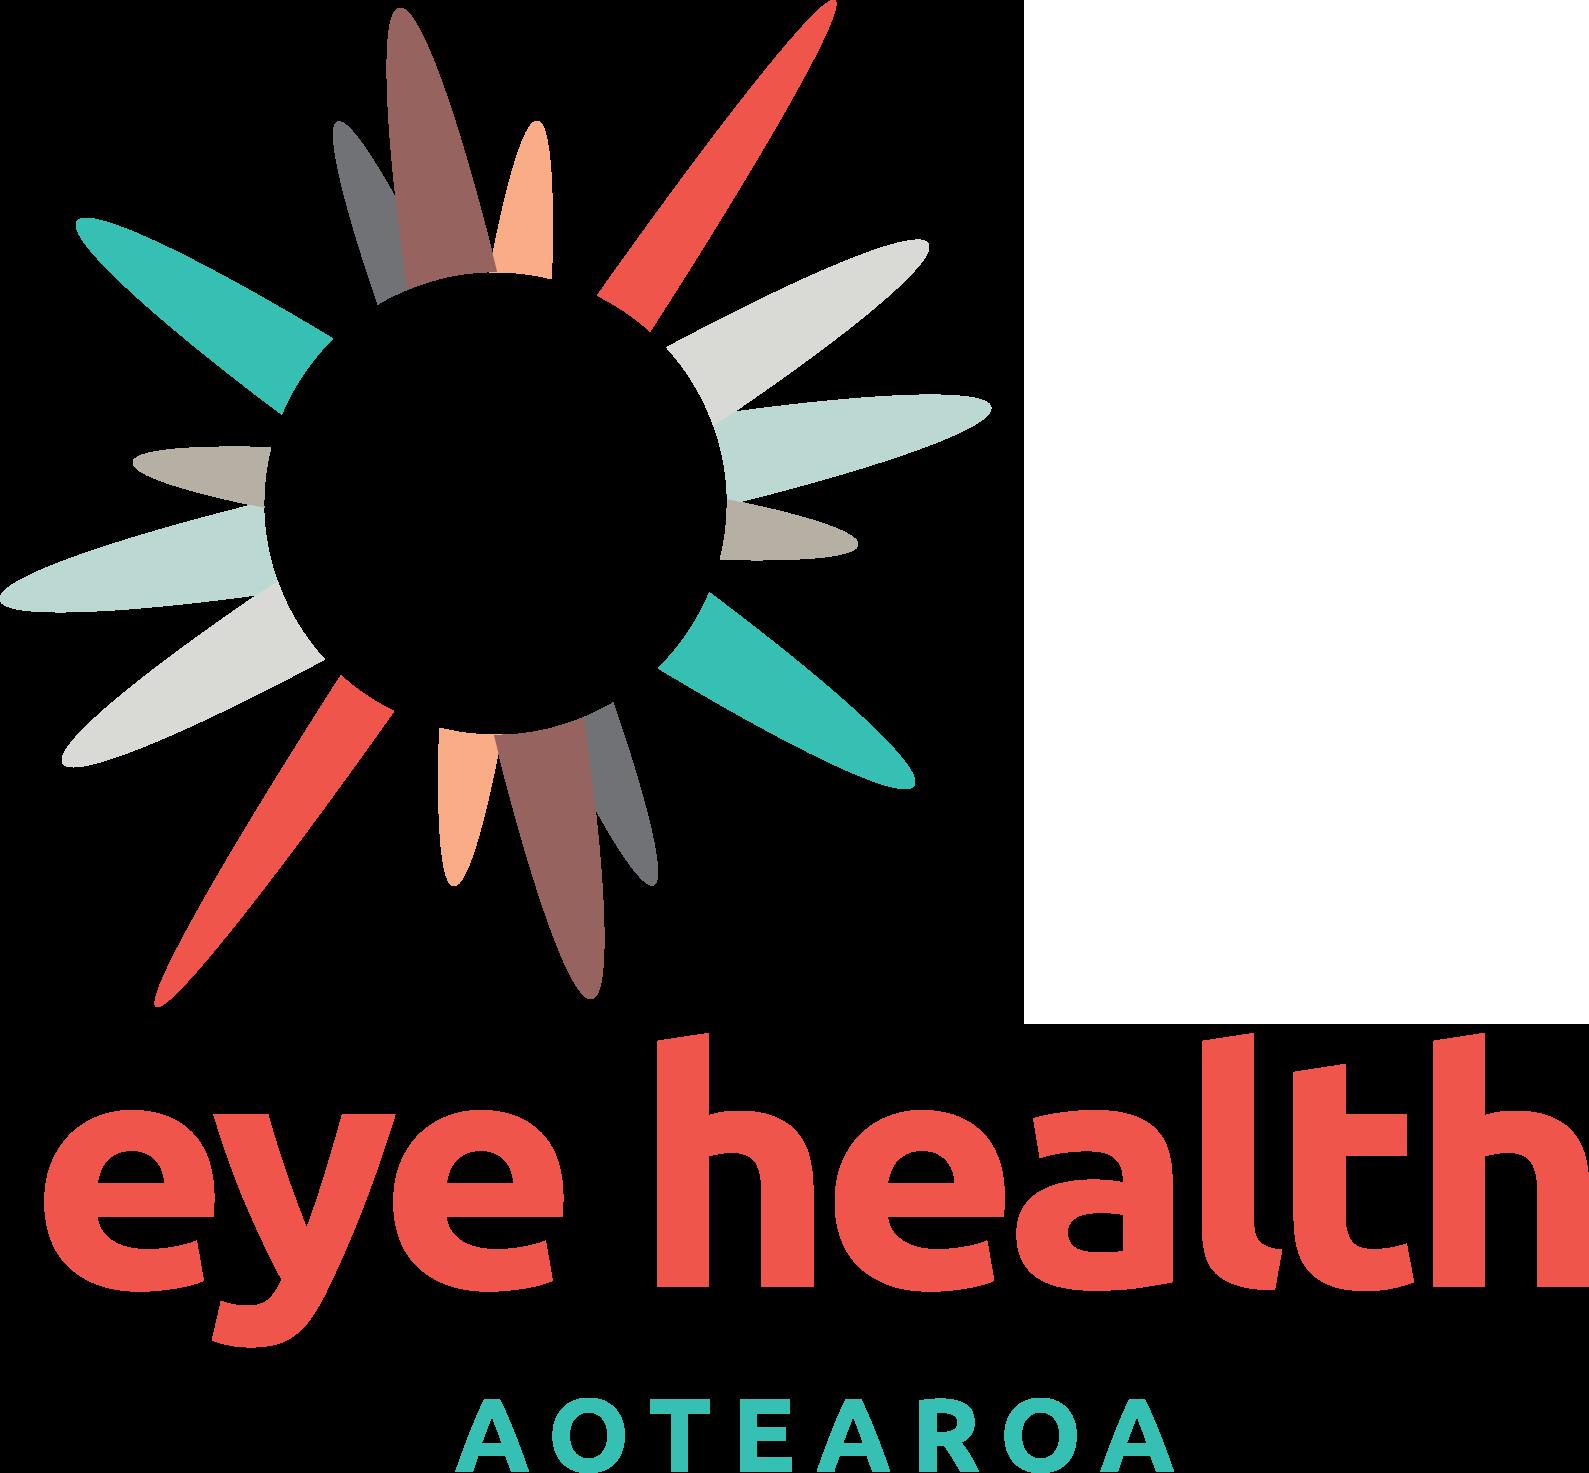 Eye Health Aotearoa multi-colour star-shaped logo